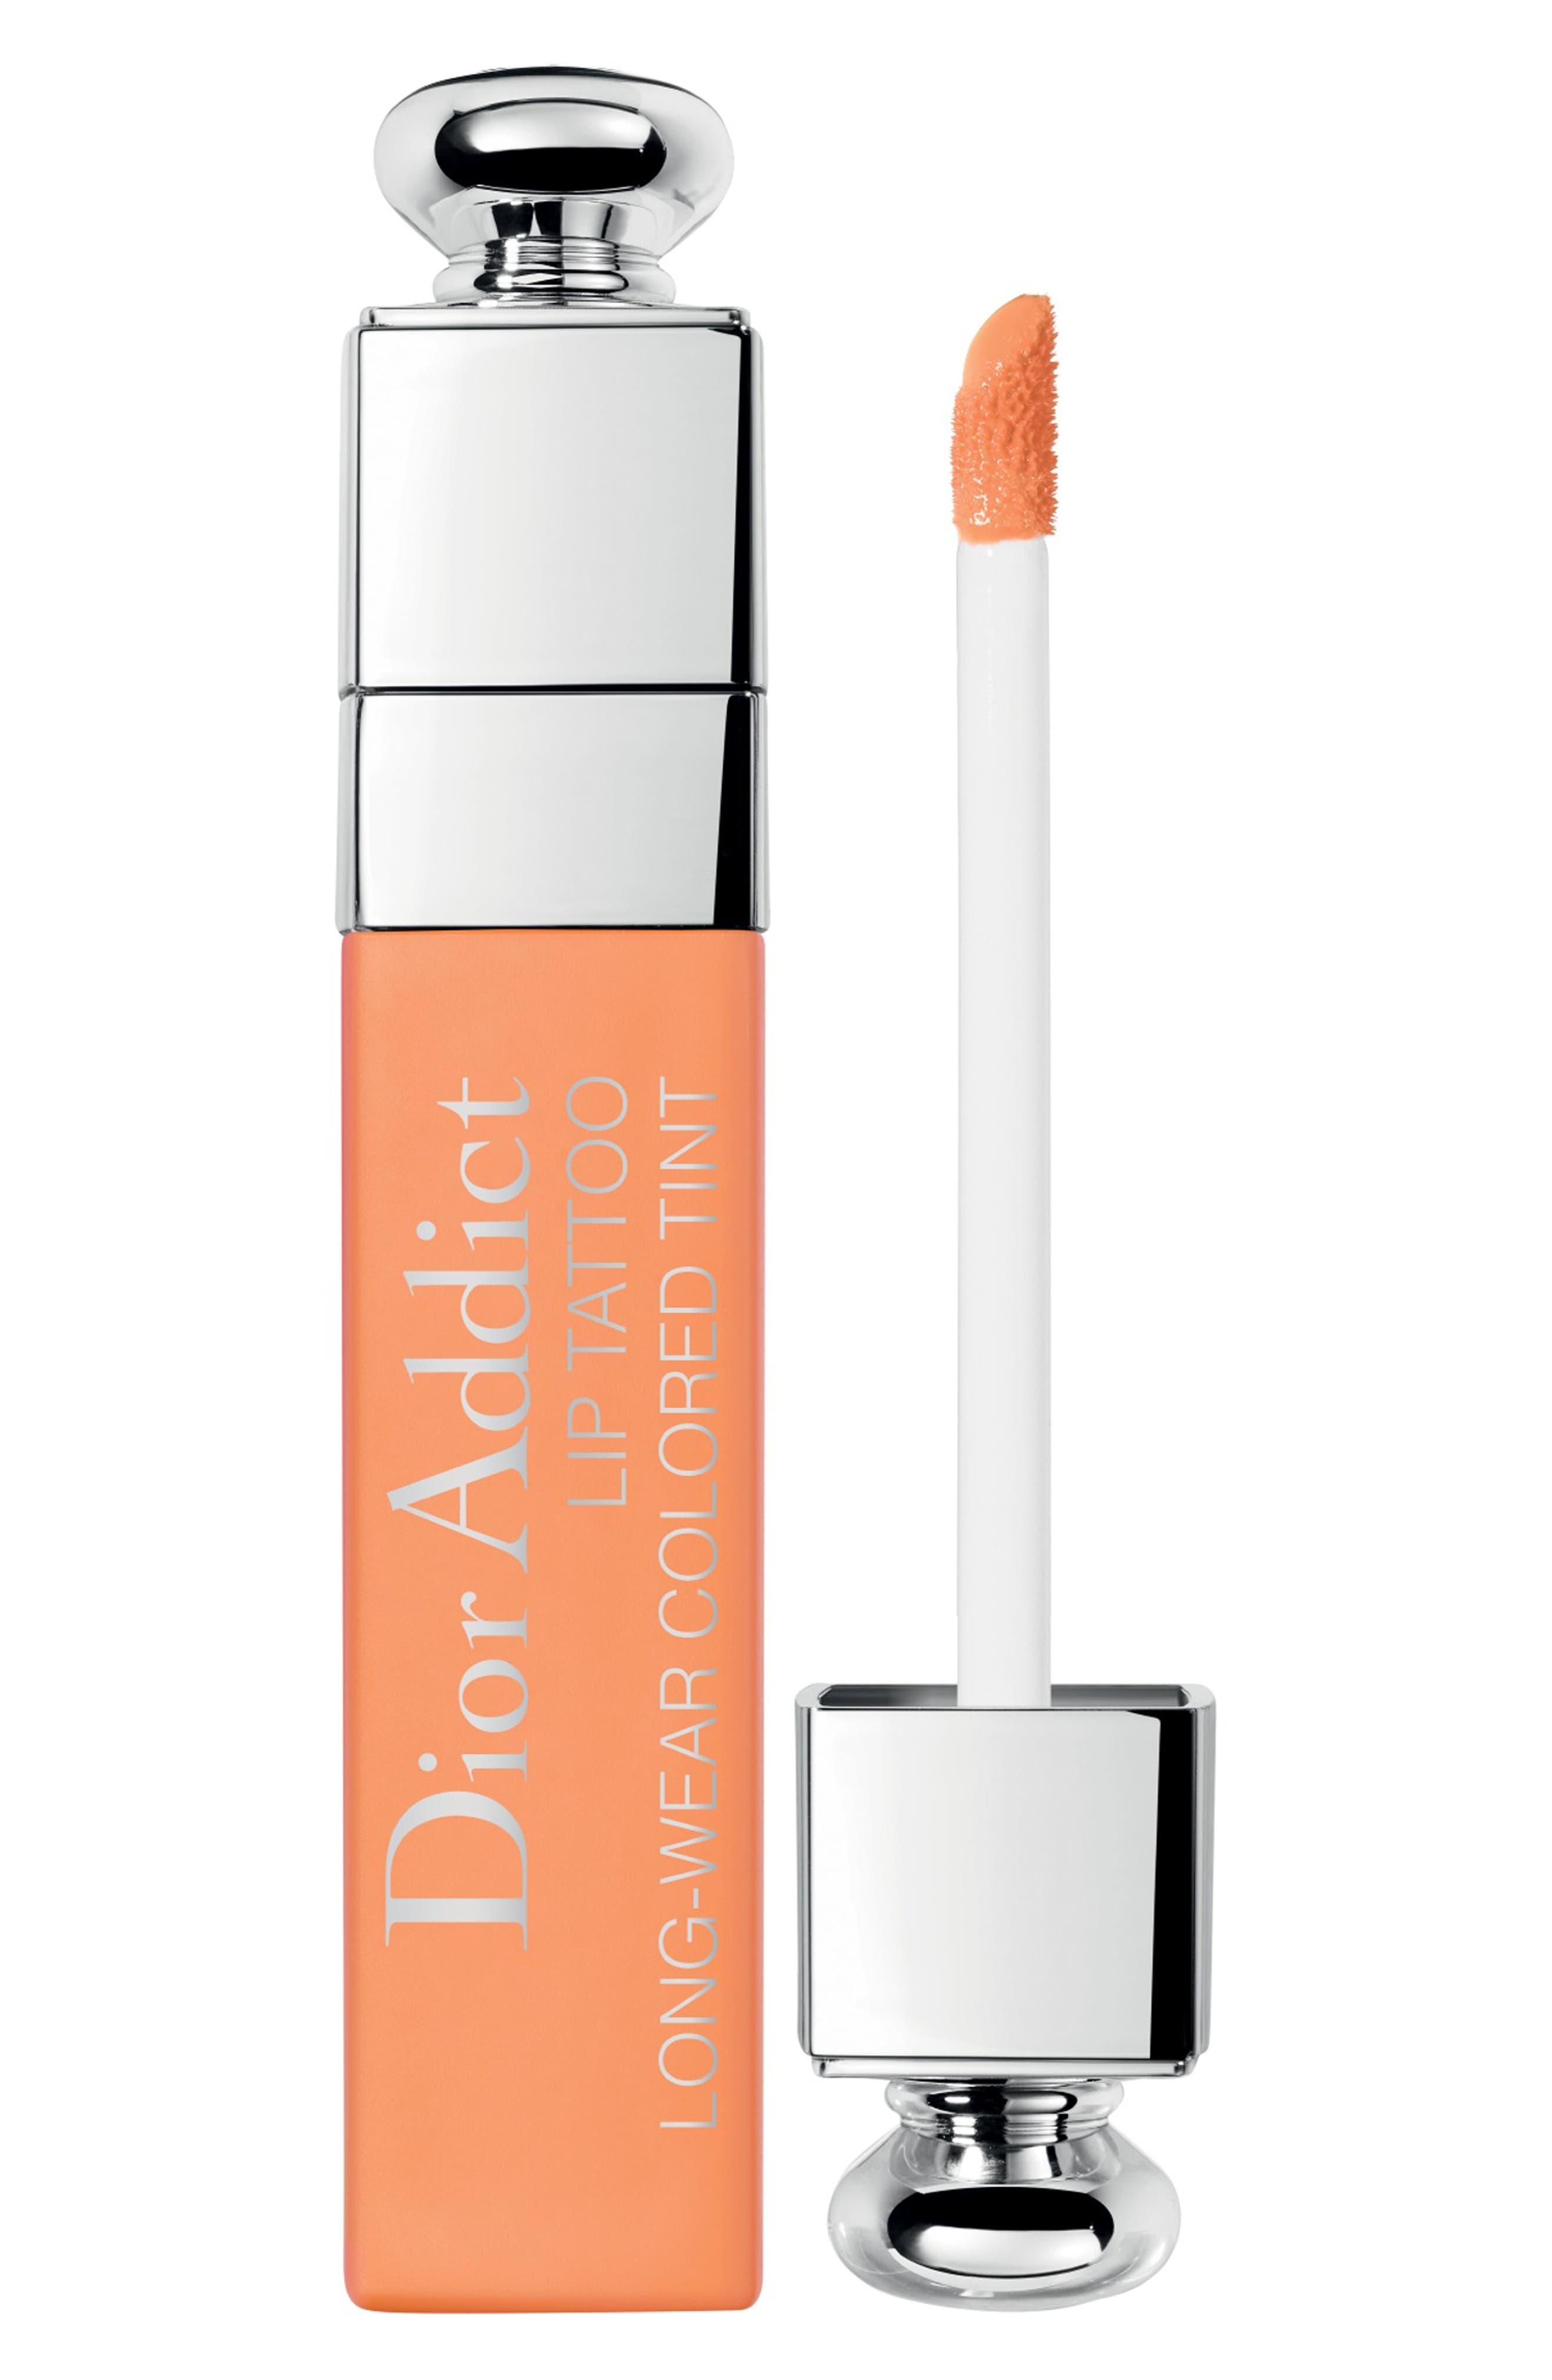 Dior Addict Lip Tattoo Long-Wearing Color Tint - 311 Natural Dune